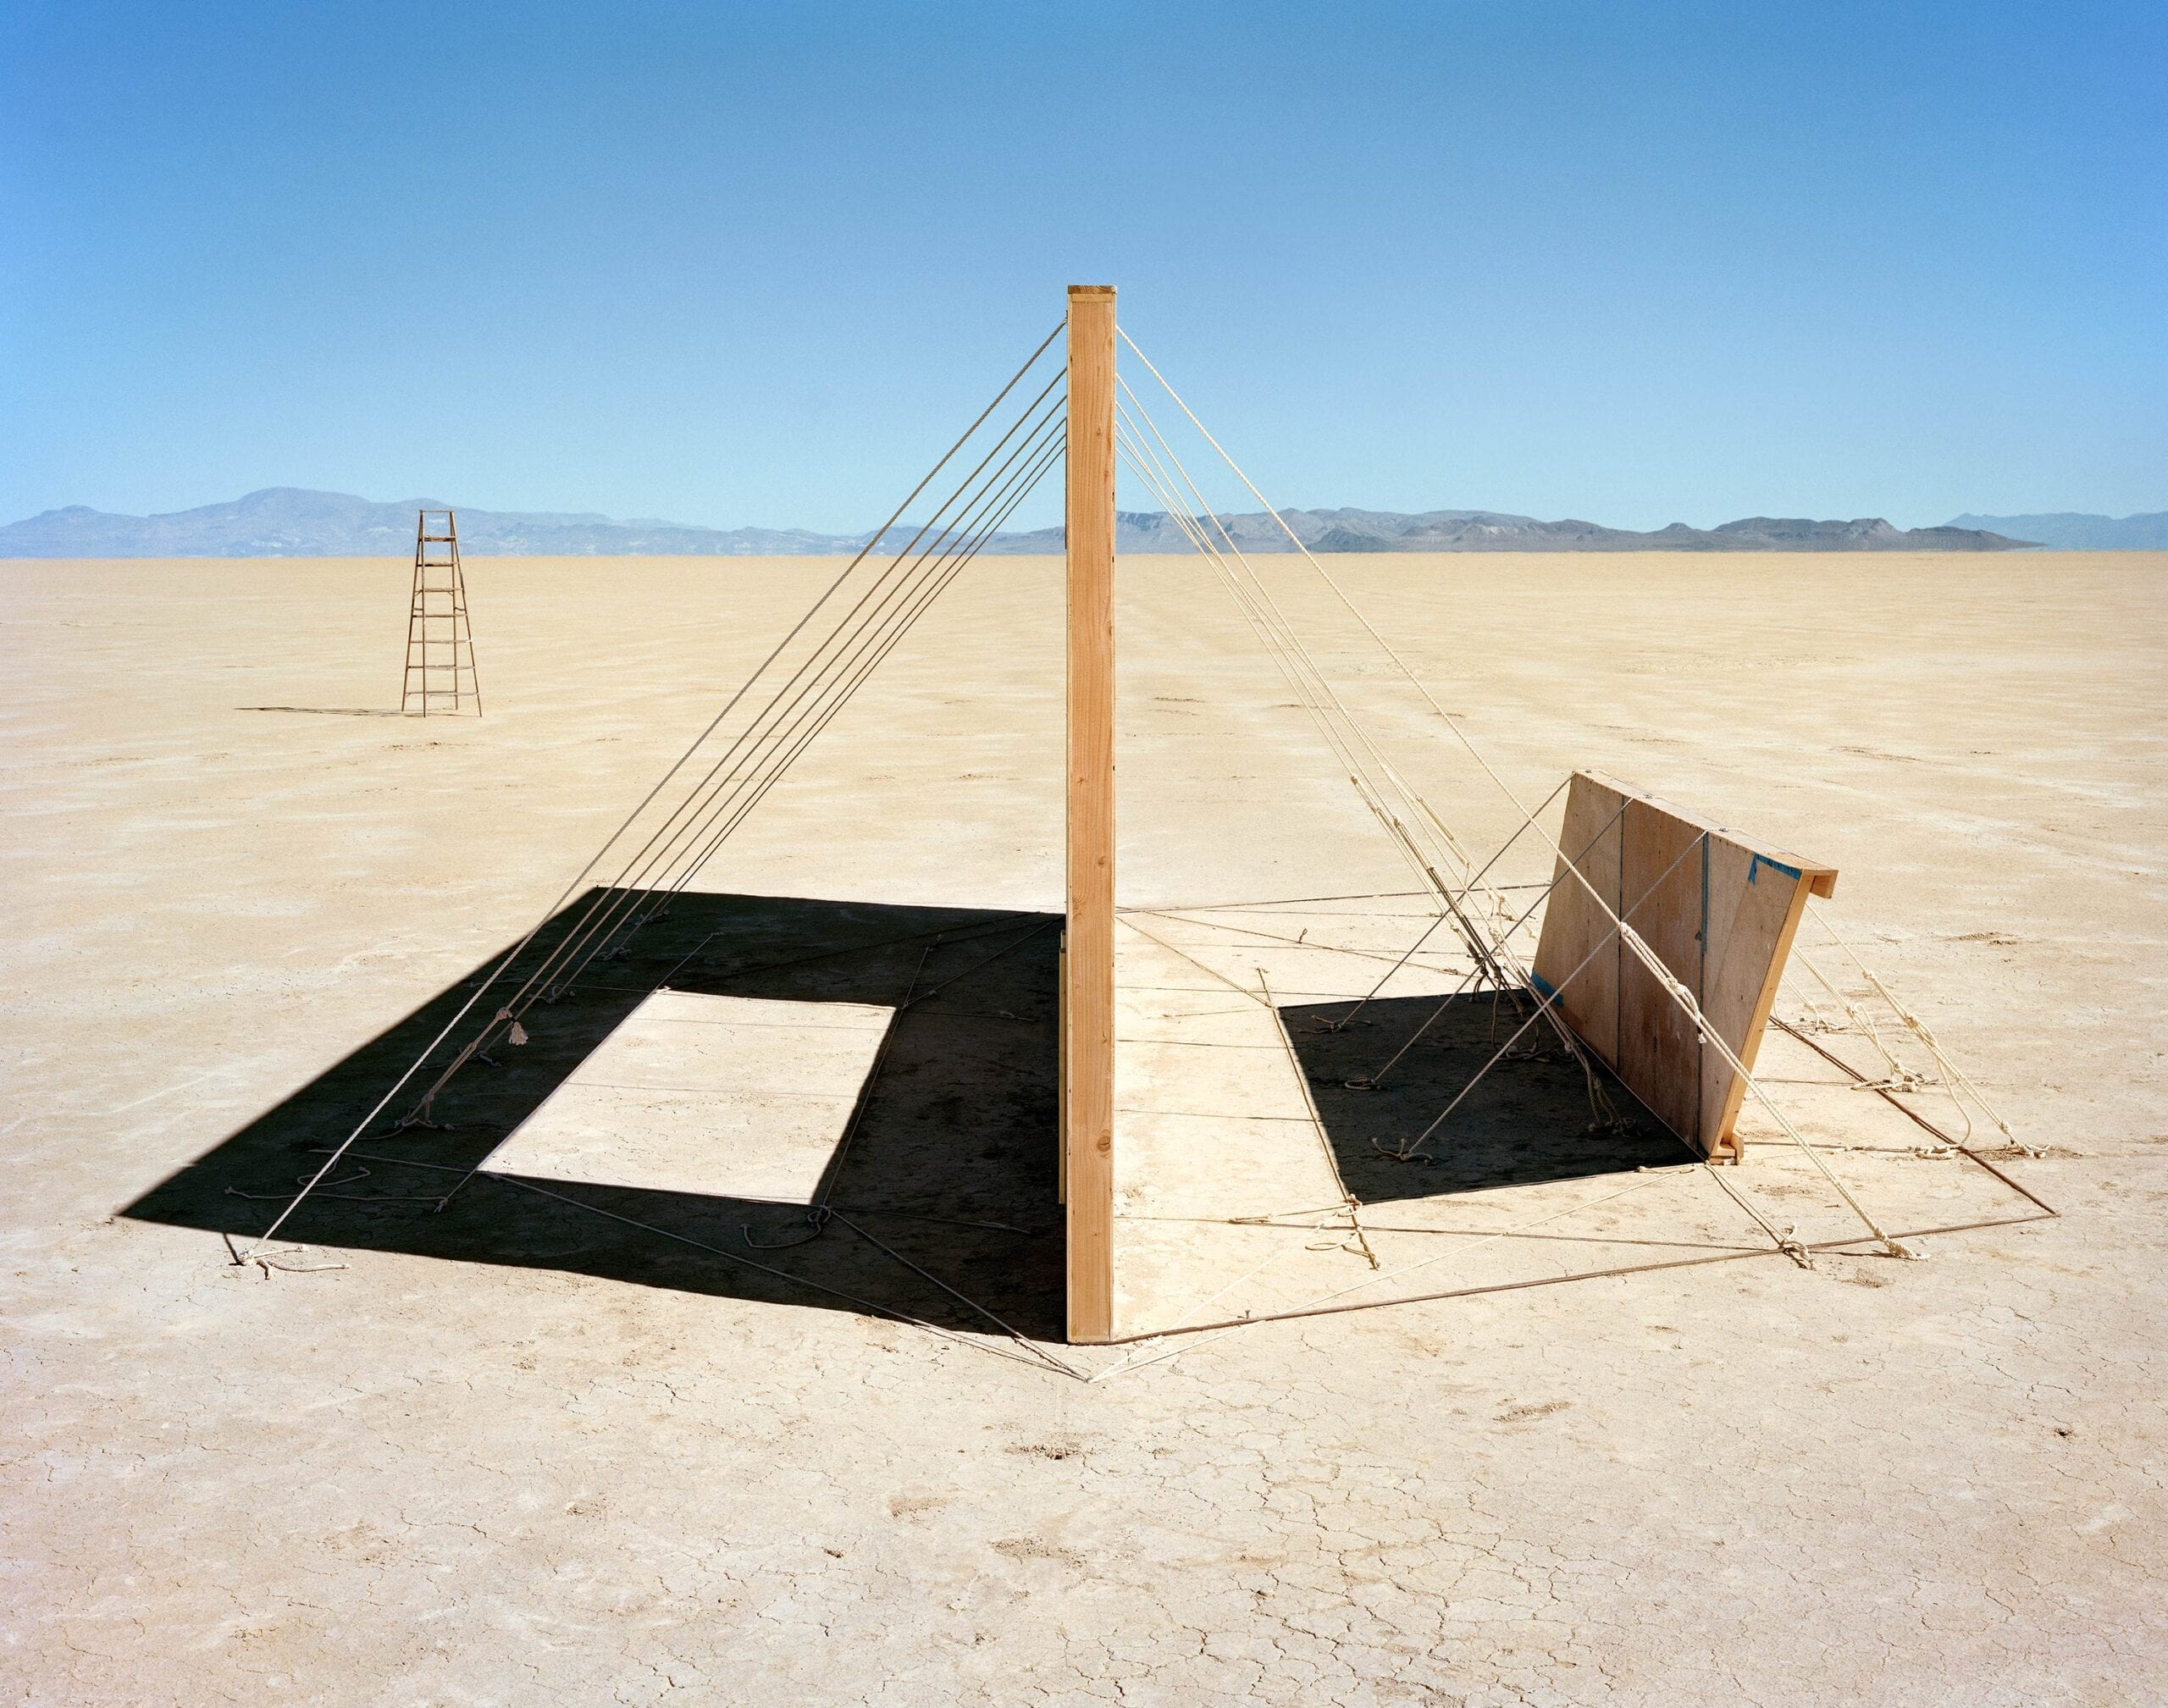 Chris Engman, Inverse Negative, Image © Luis De Jesus Los Angeles